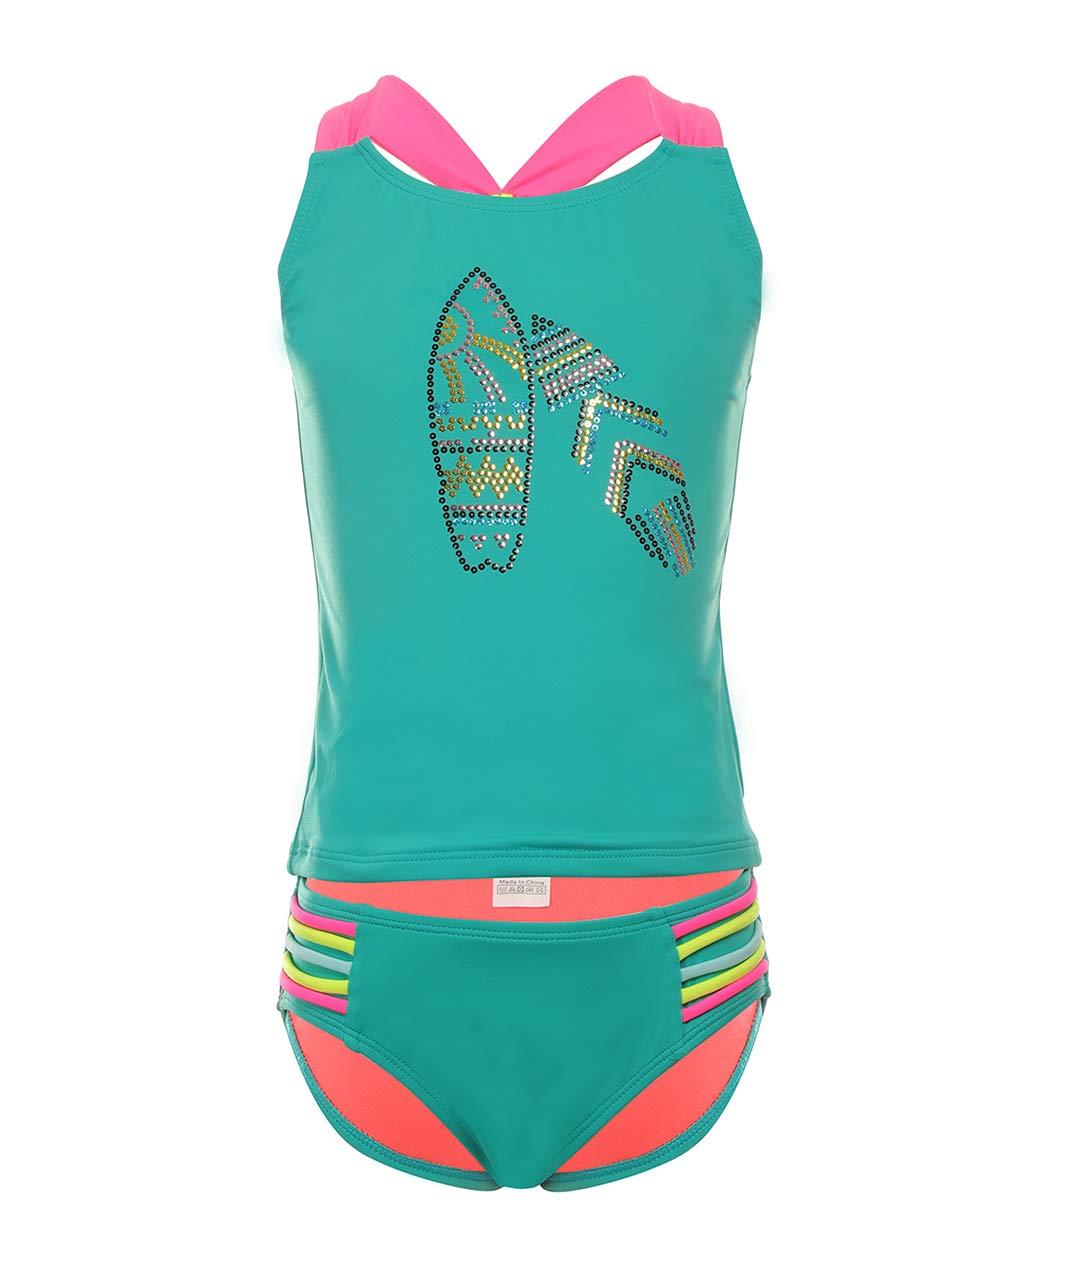 BELLOO Kids Big Girls Two Pieces Swimsuits, Tankini Sets Bathing Suit Swimwear XS Green